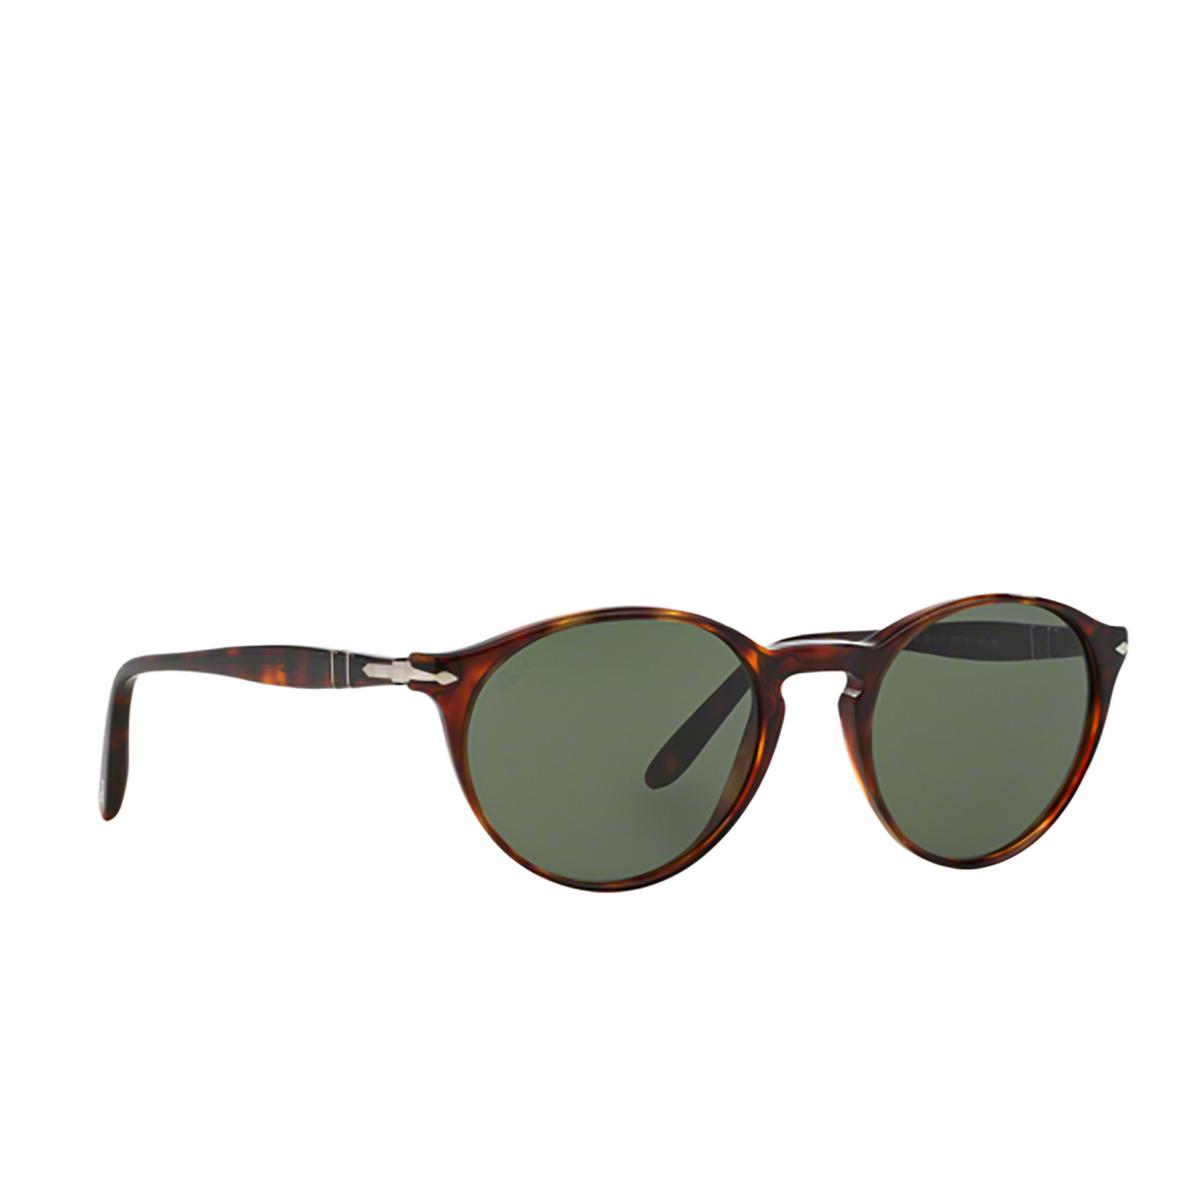 Persol® Round Sunglasses: PO3092SM color Havana 901531 - three-quarters view.